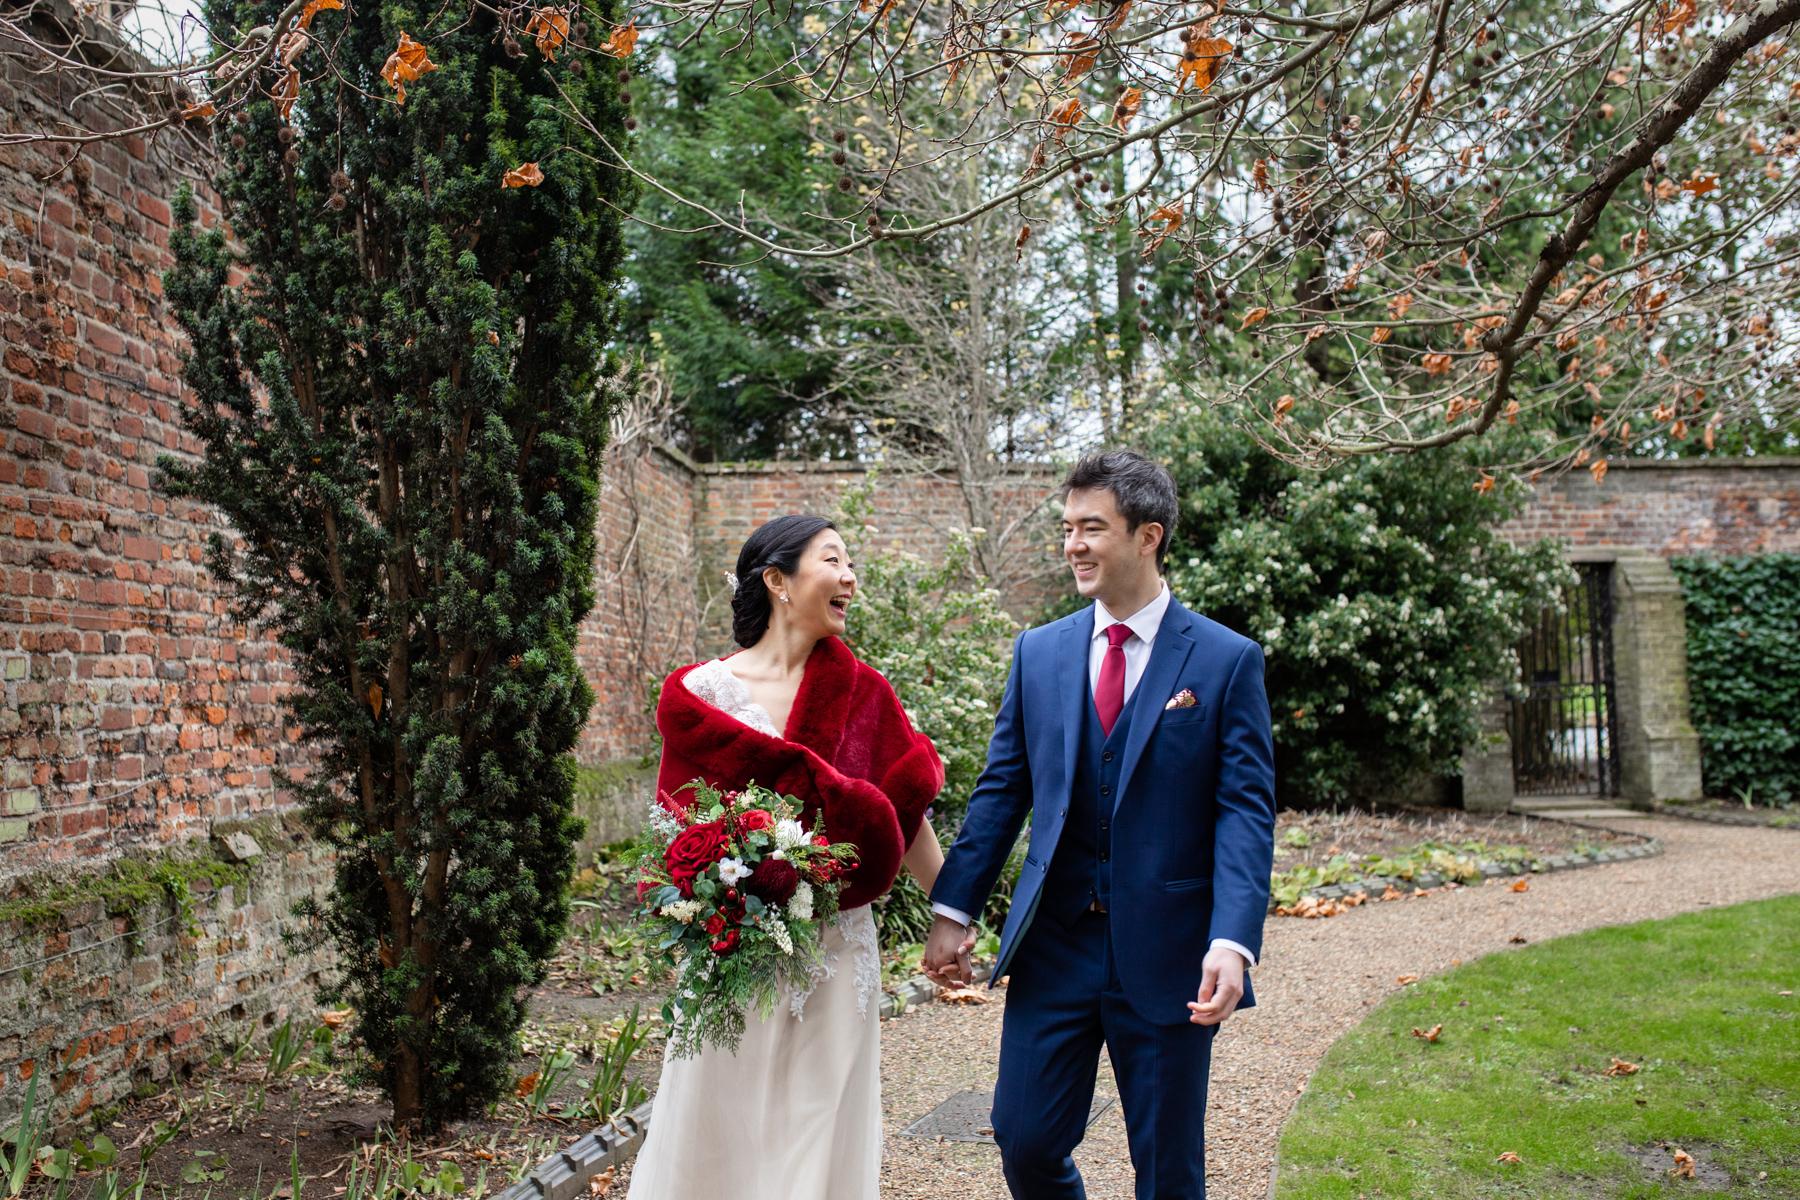 Bride and groom at Emmanual College Cambridge